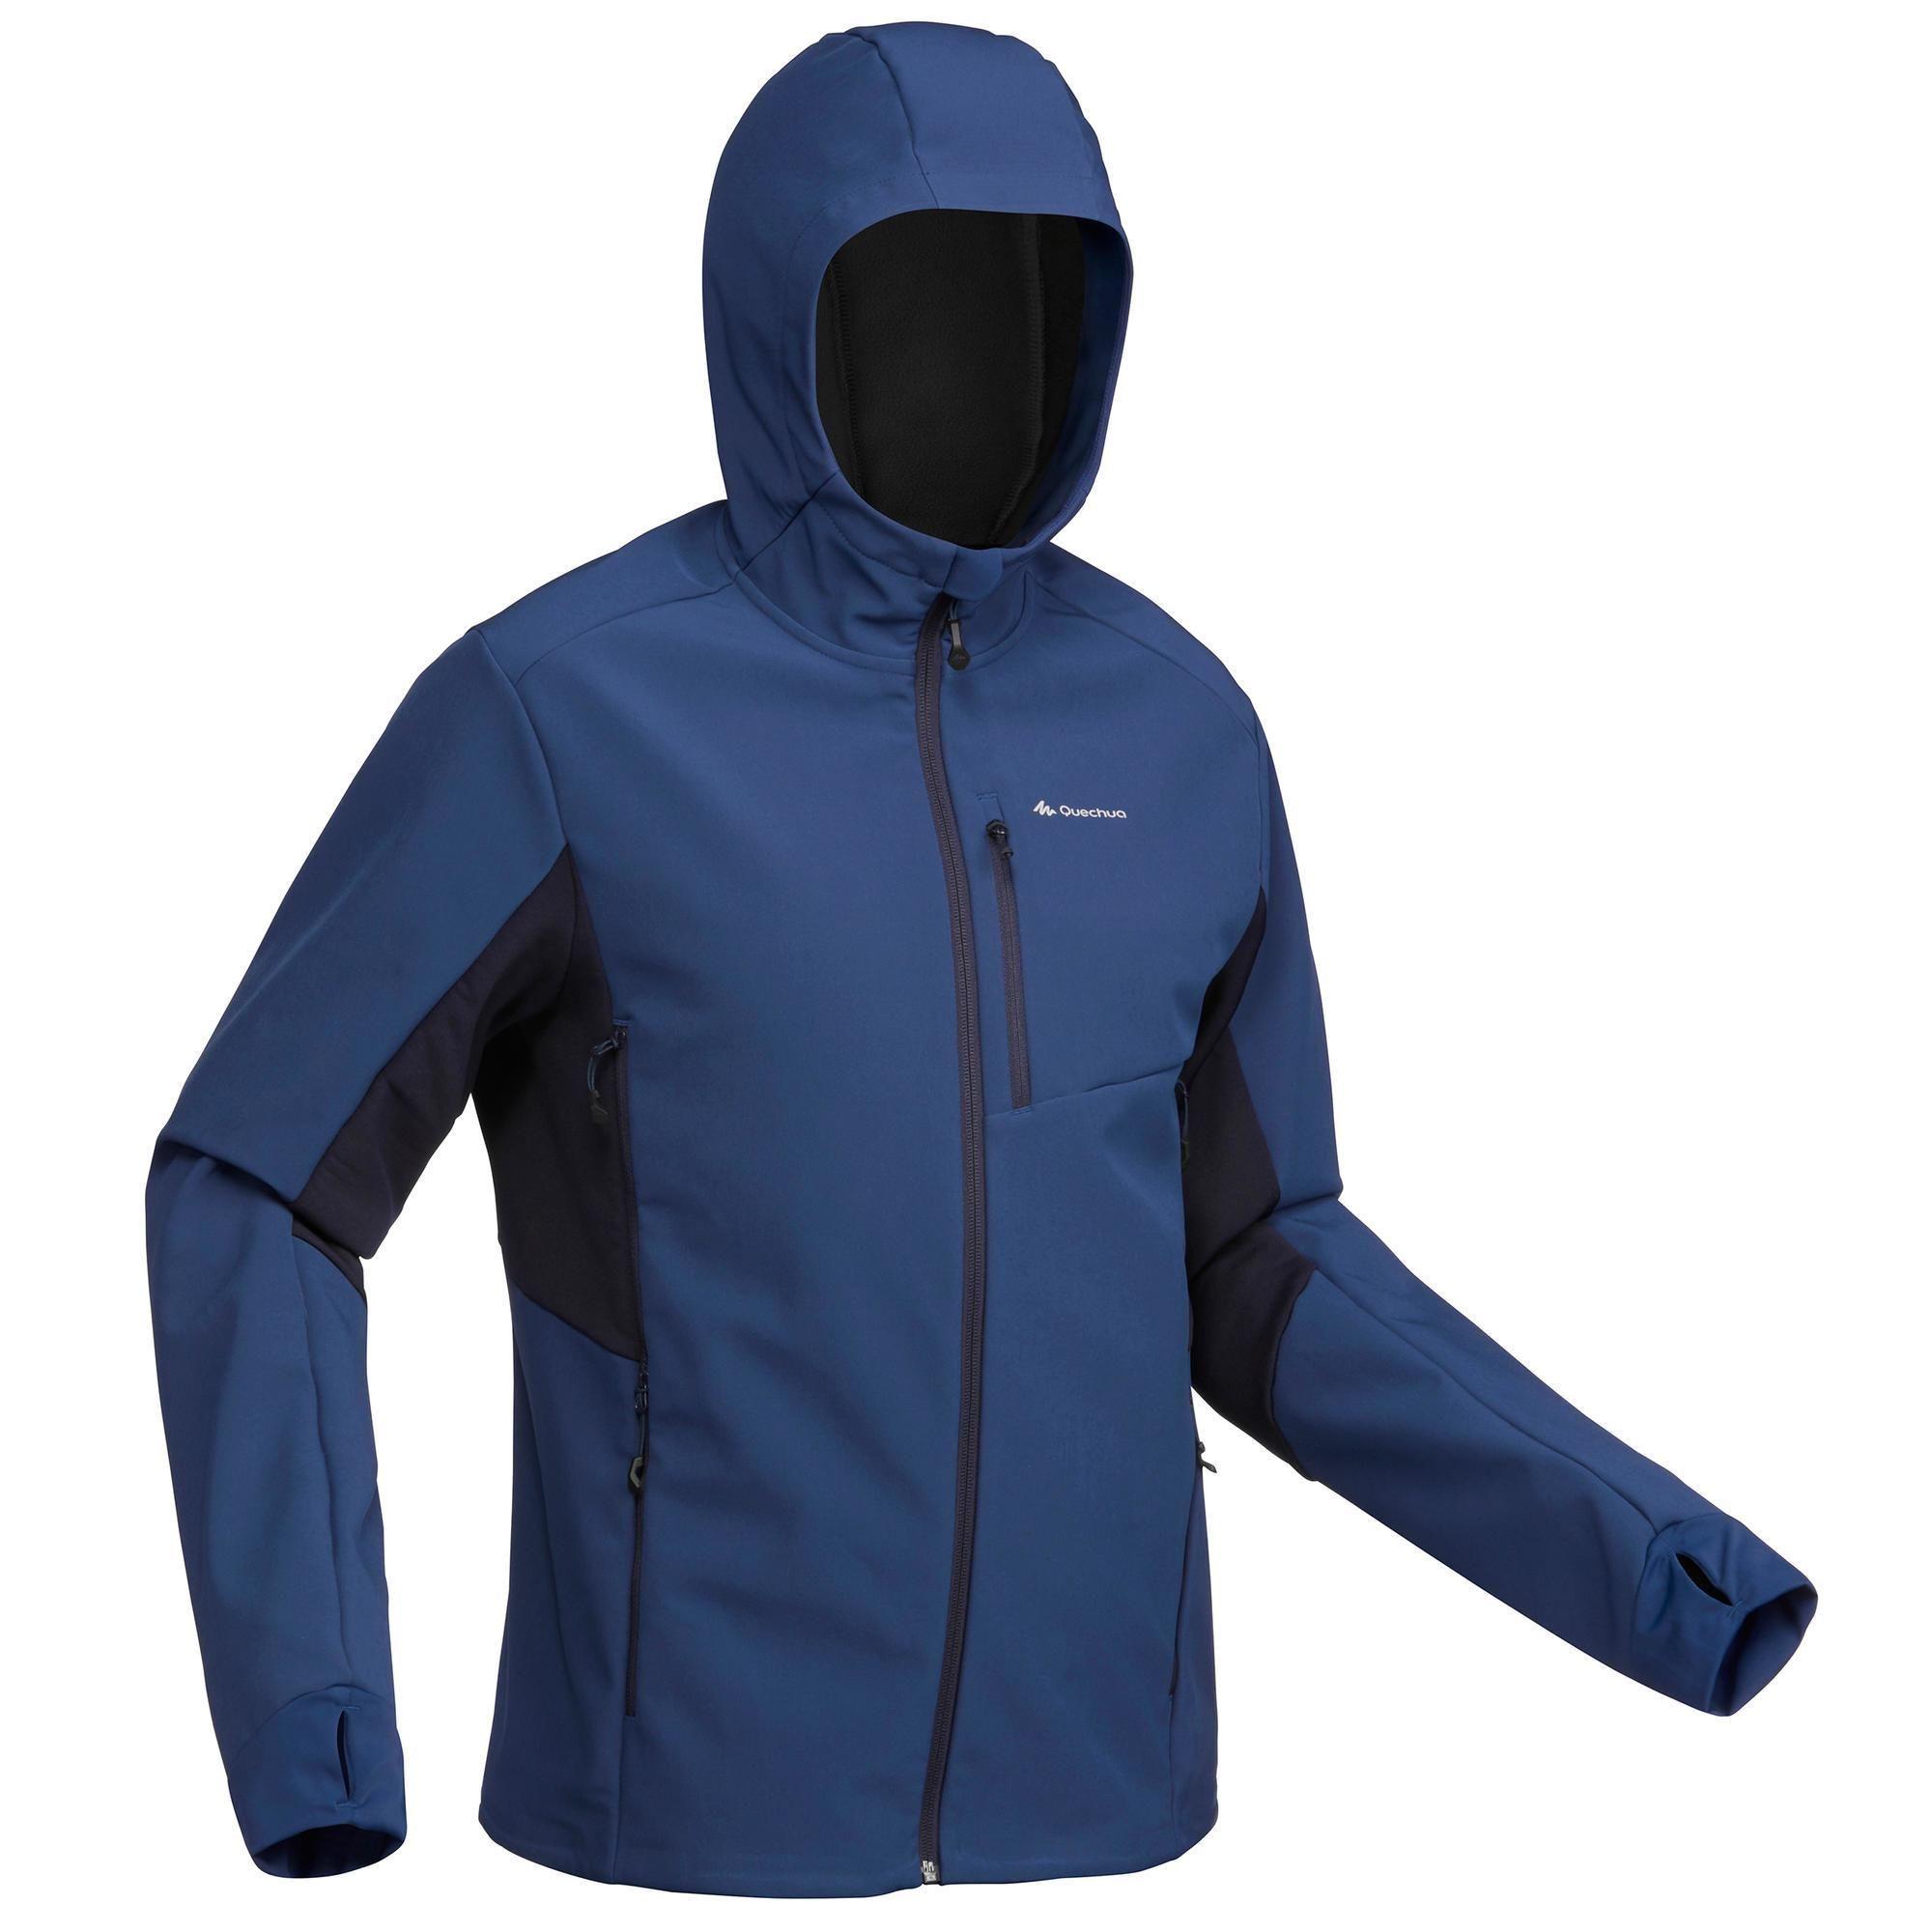 Softshelljacke Trek 500 Windwarm Herren Blau Herren Outfit Softshell Jacke Manner Mode